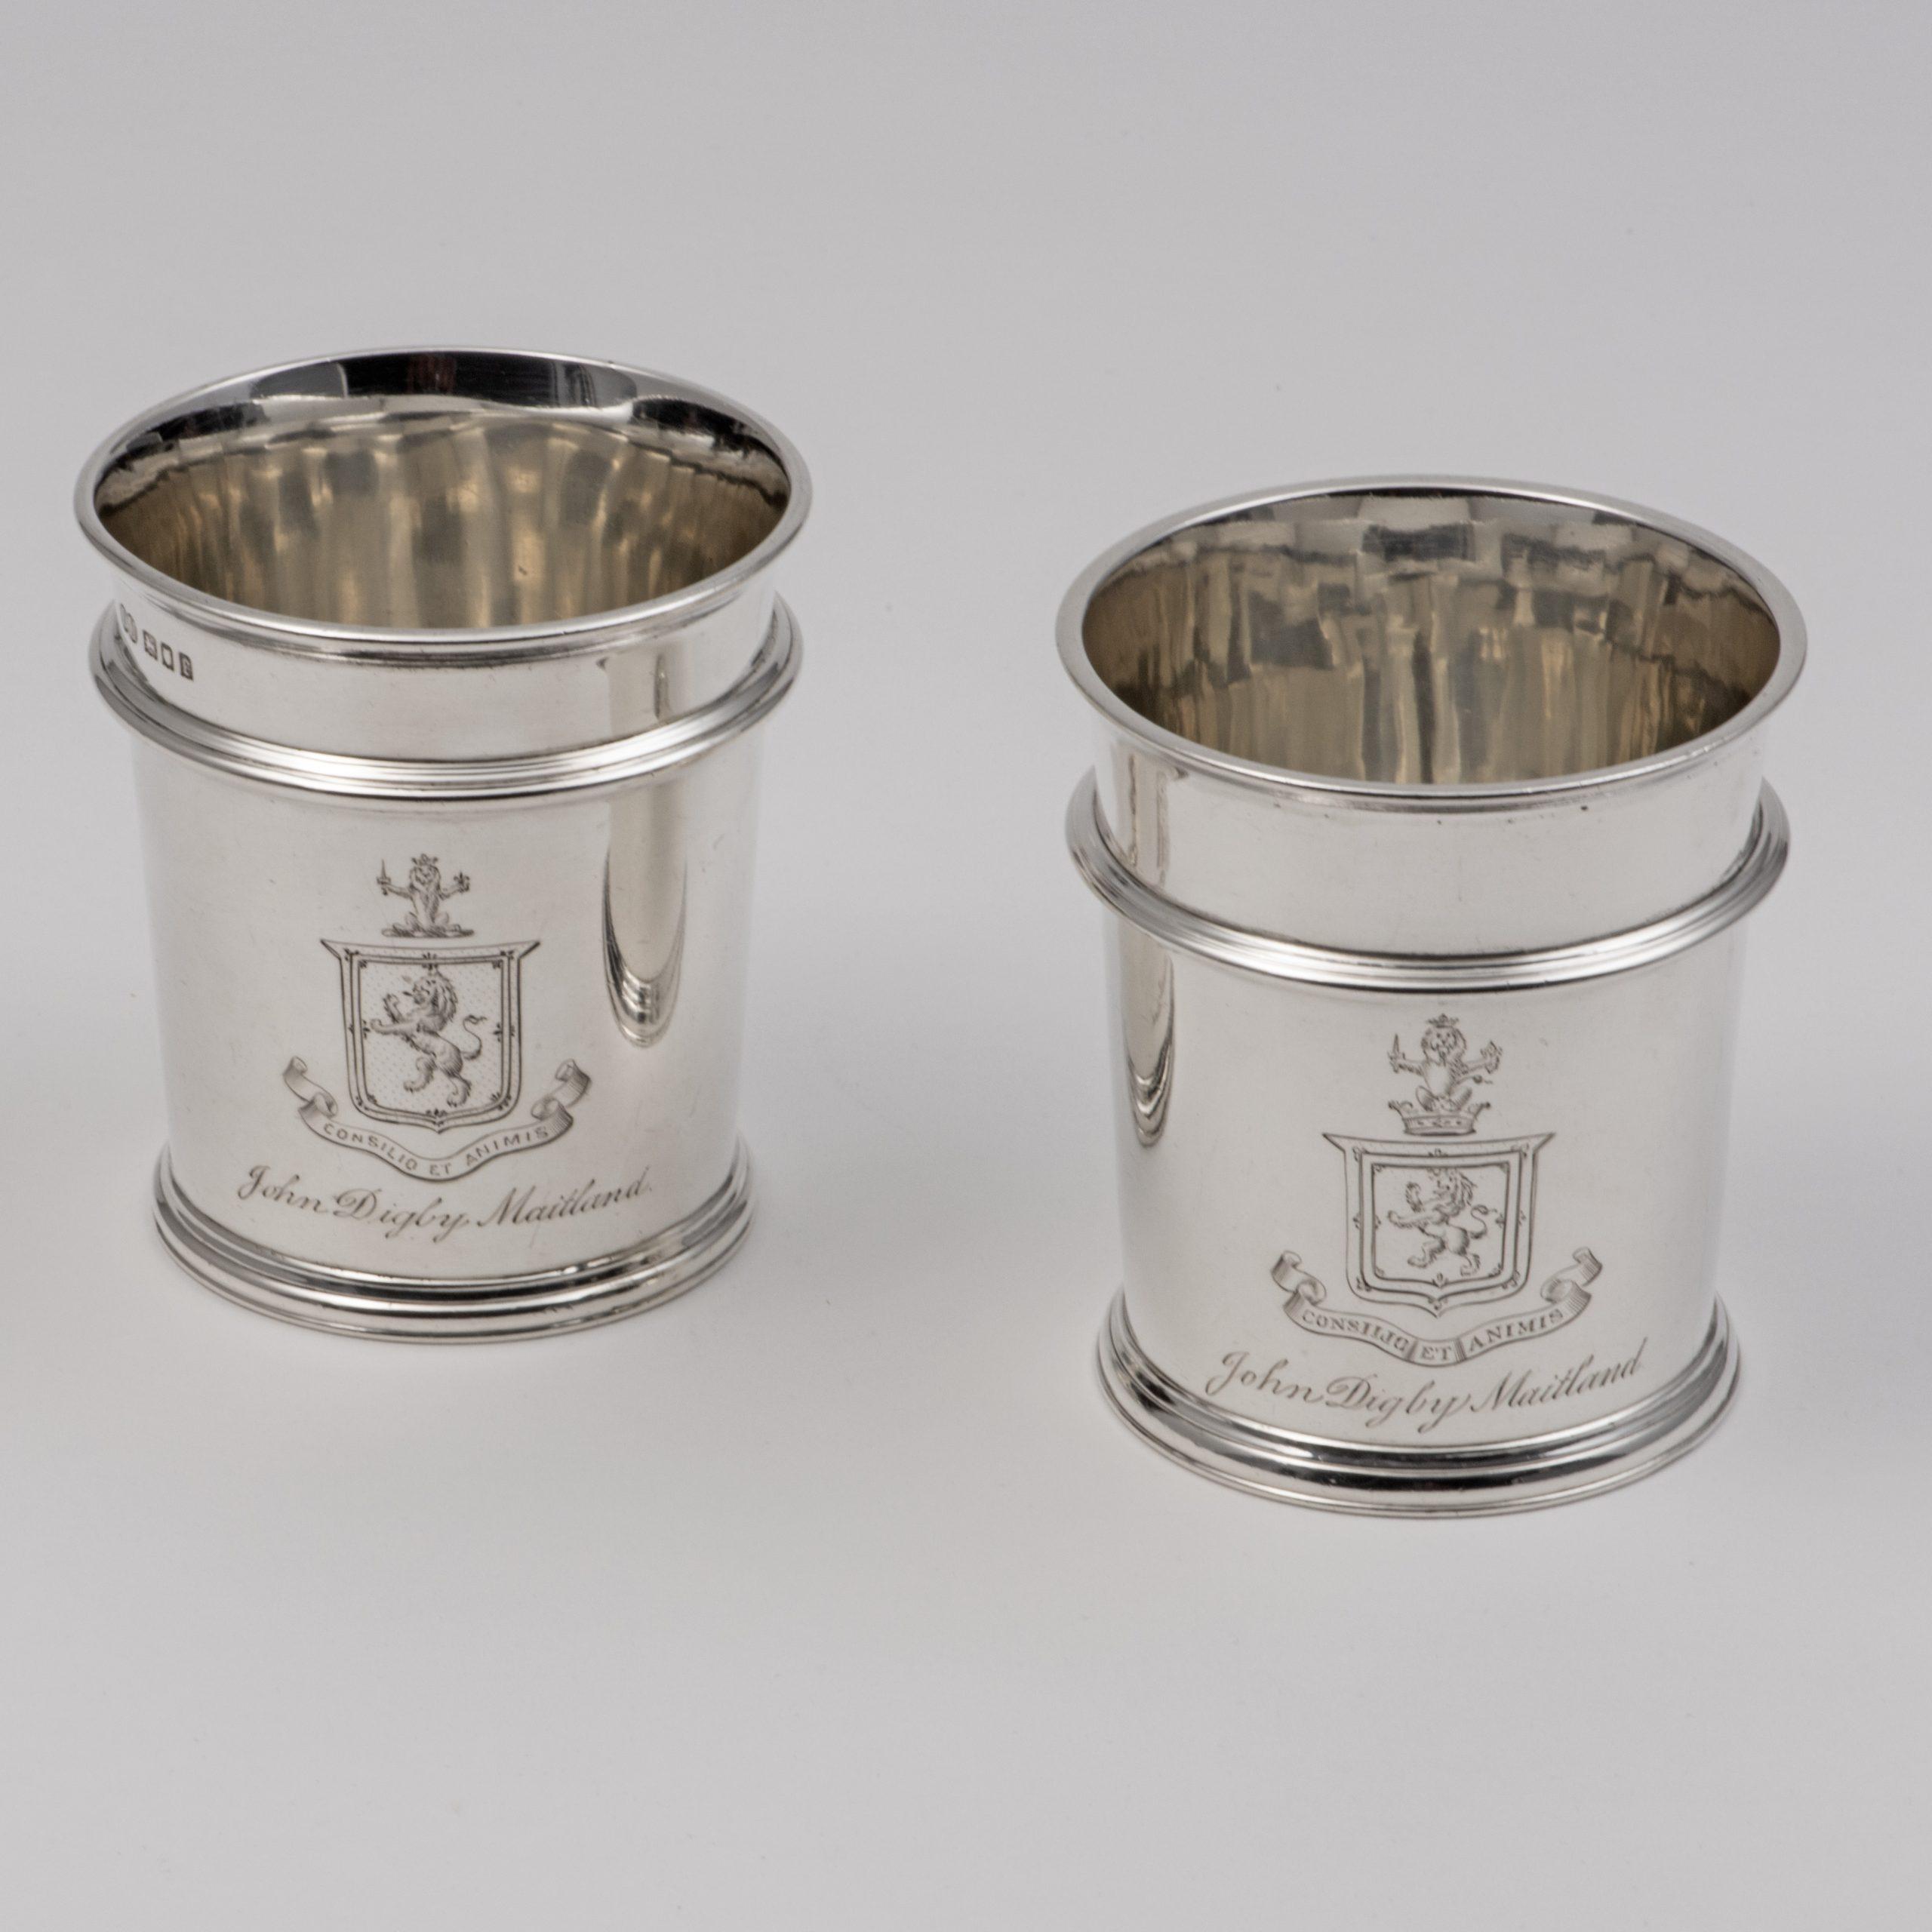 Two Plain Silver Beakers.